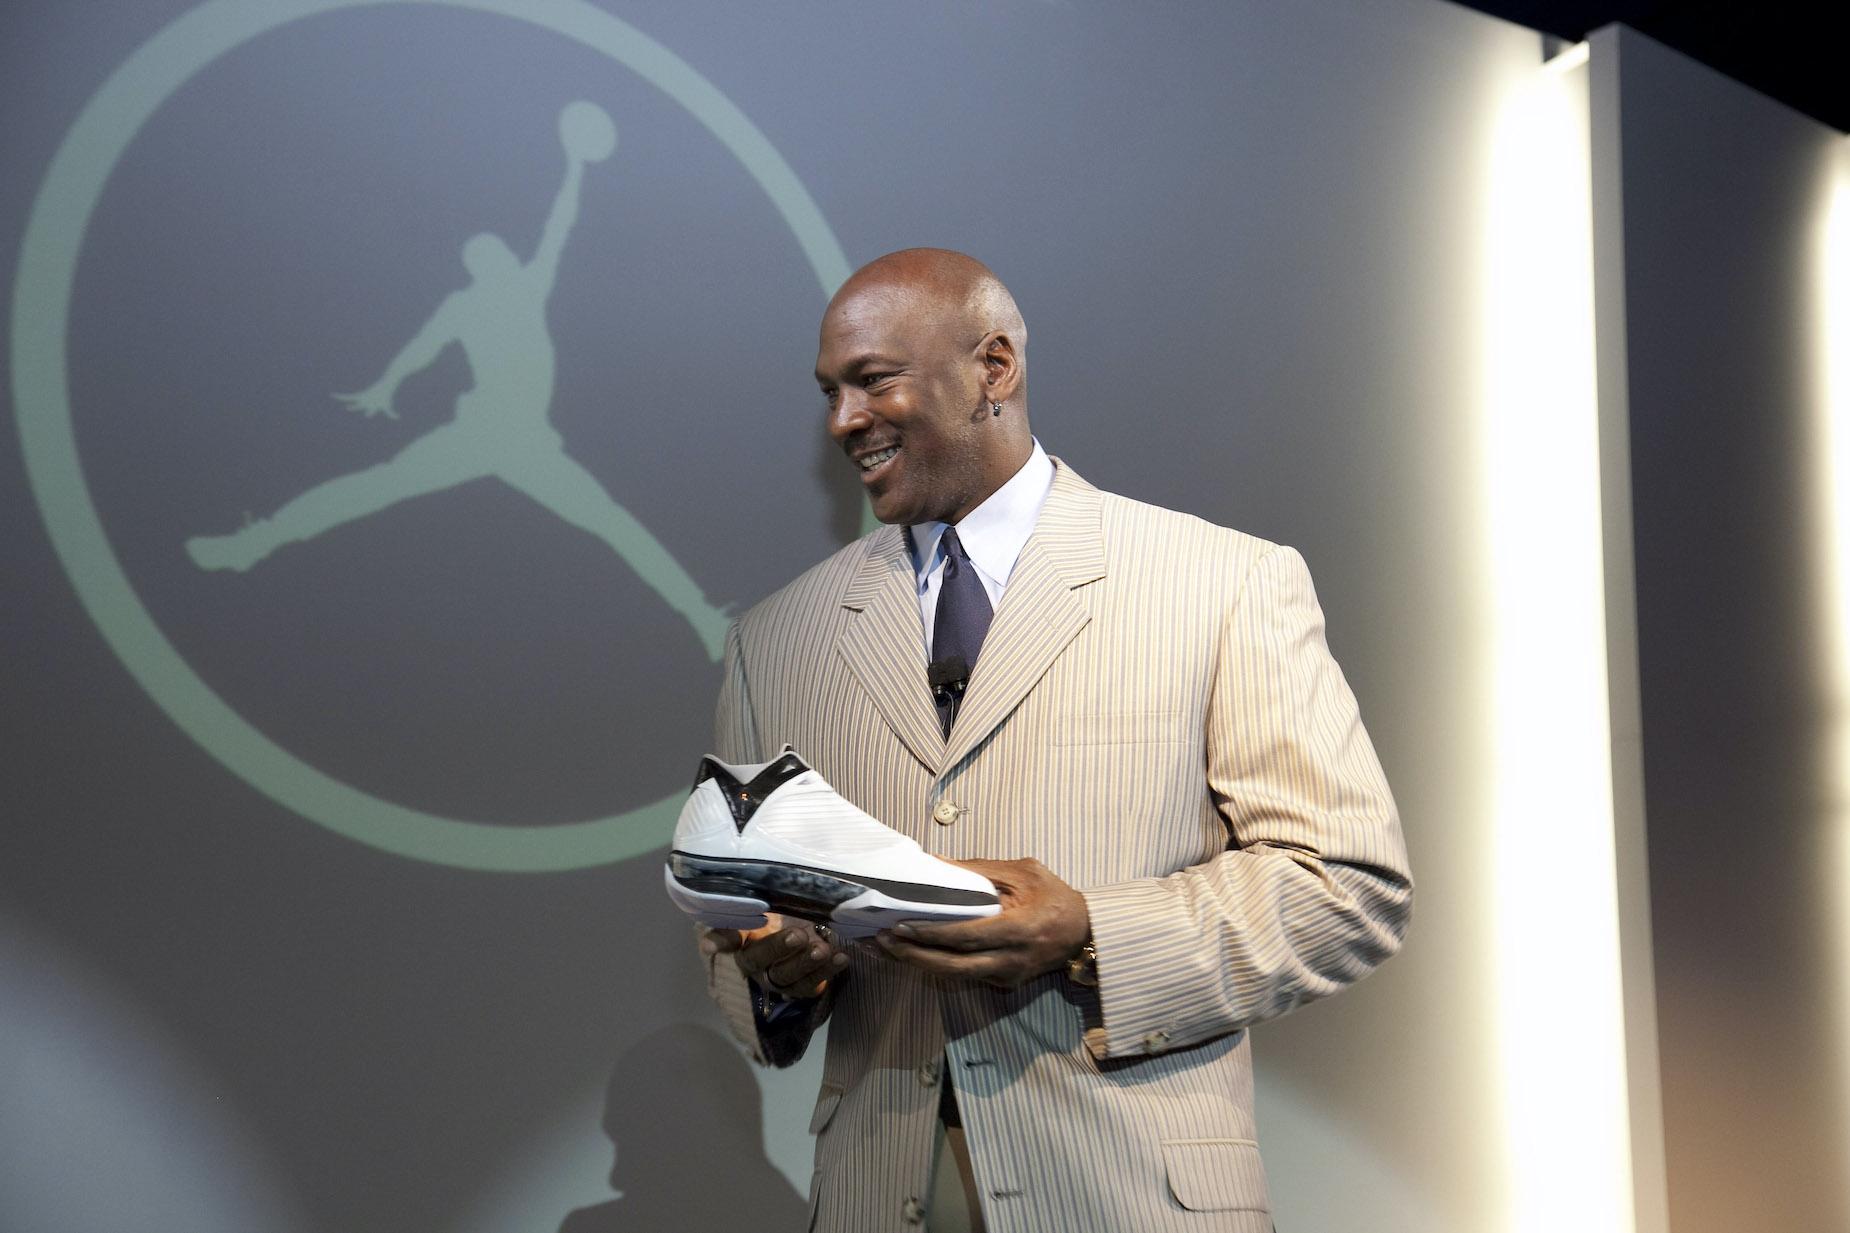 Michael Jordan holds an Air Jordan shoe during a 2009 media event.